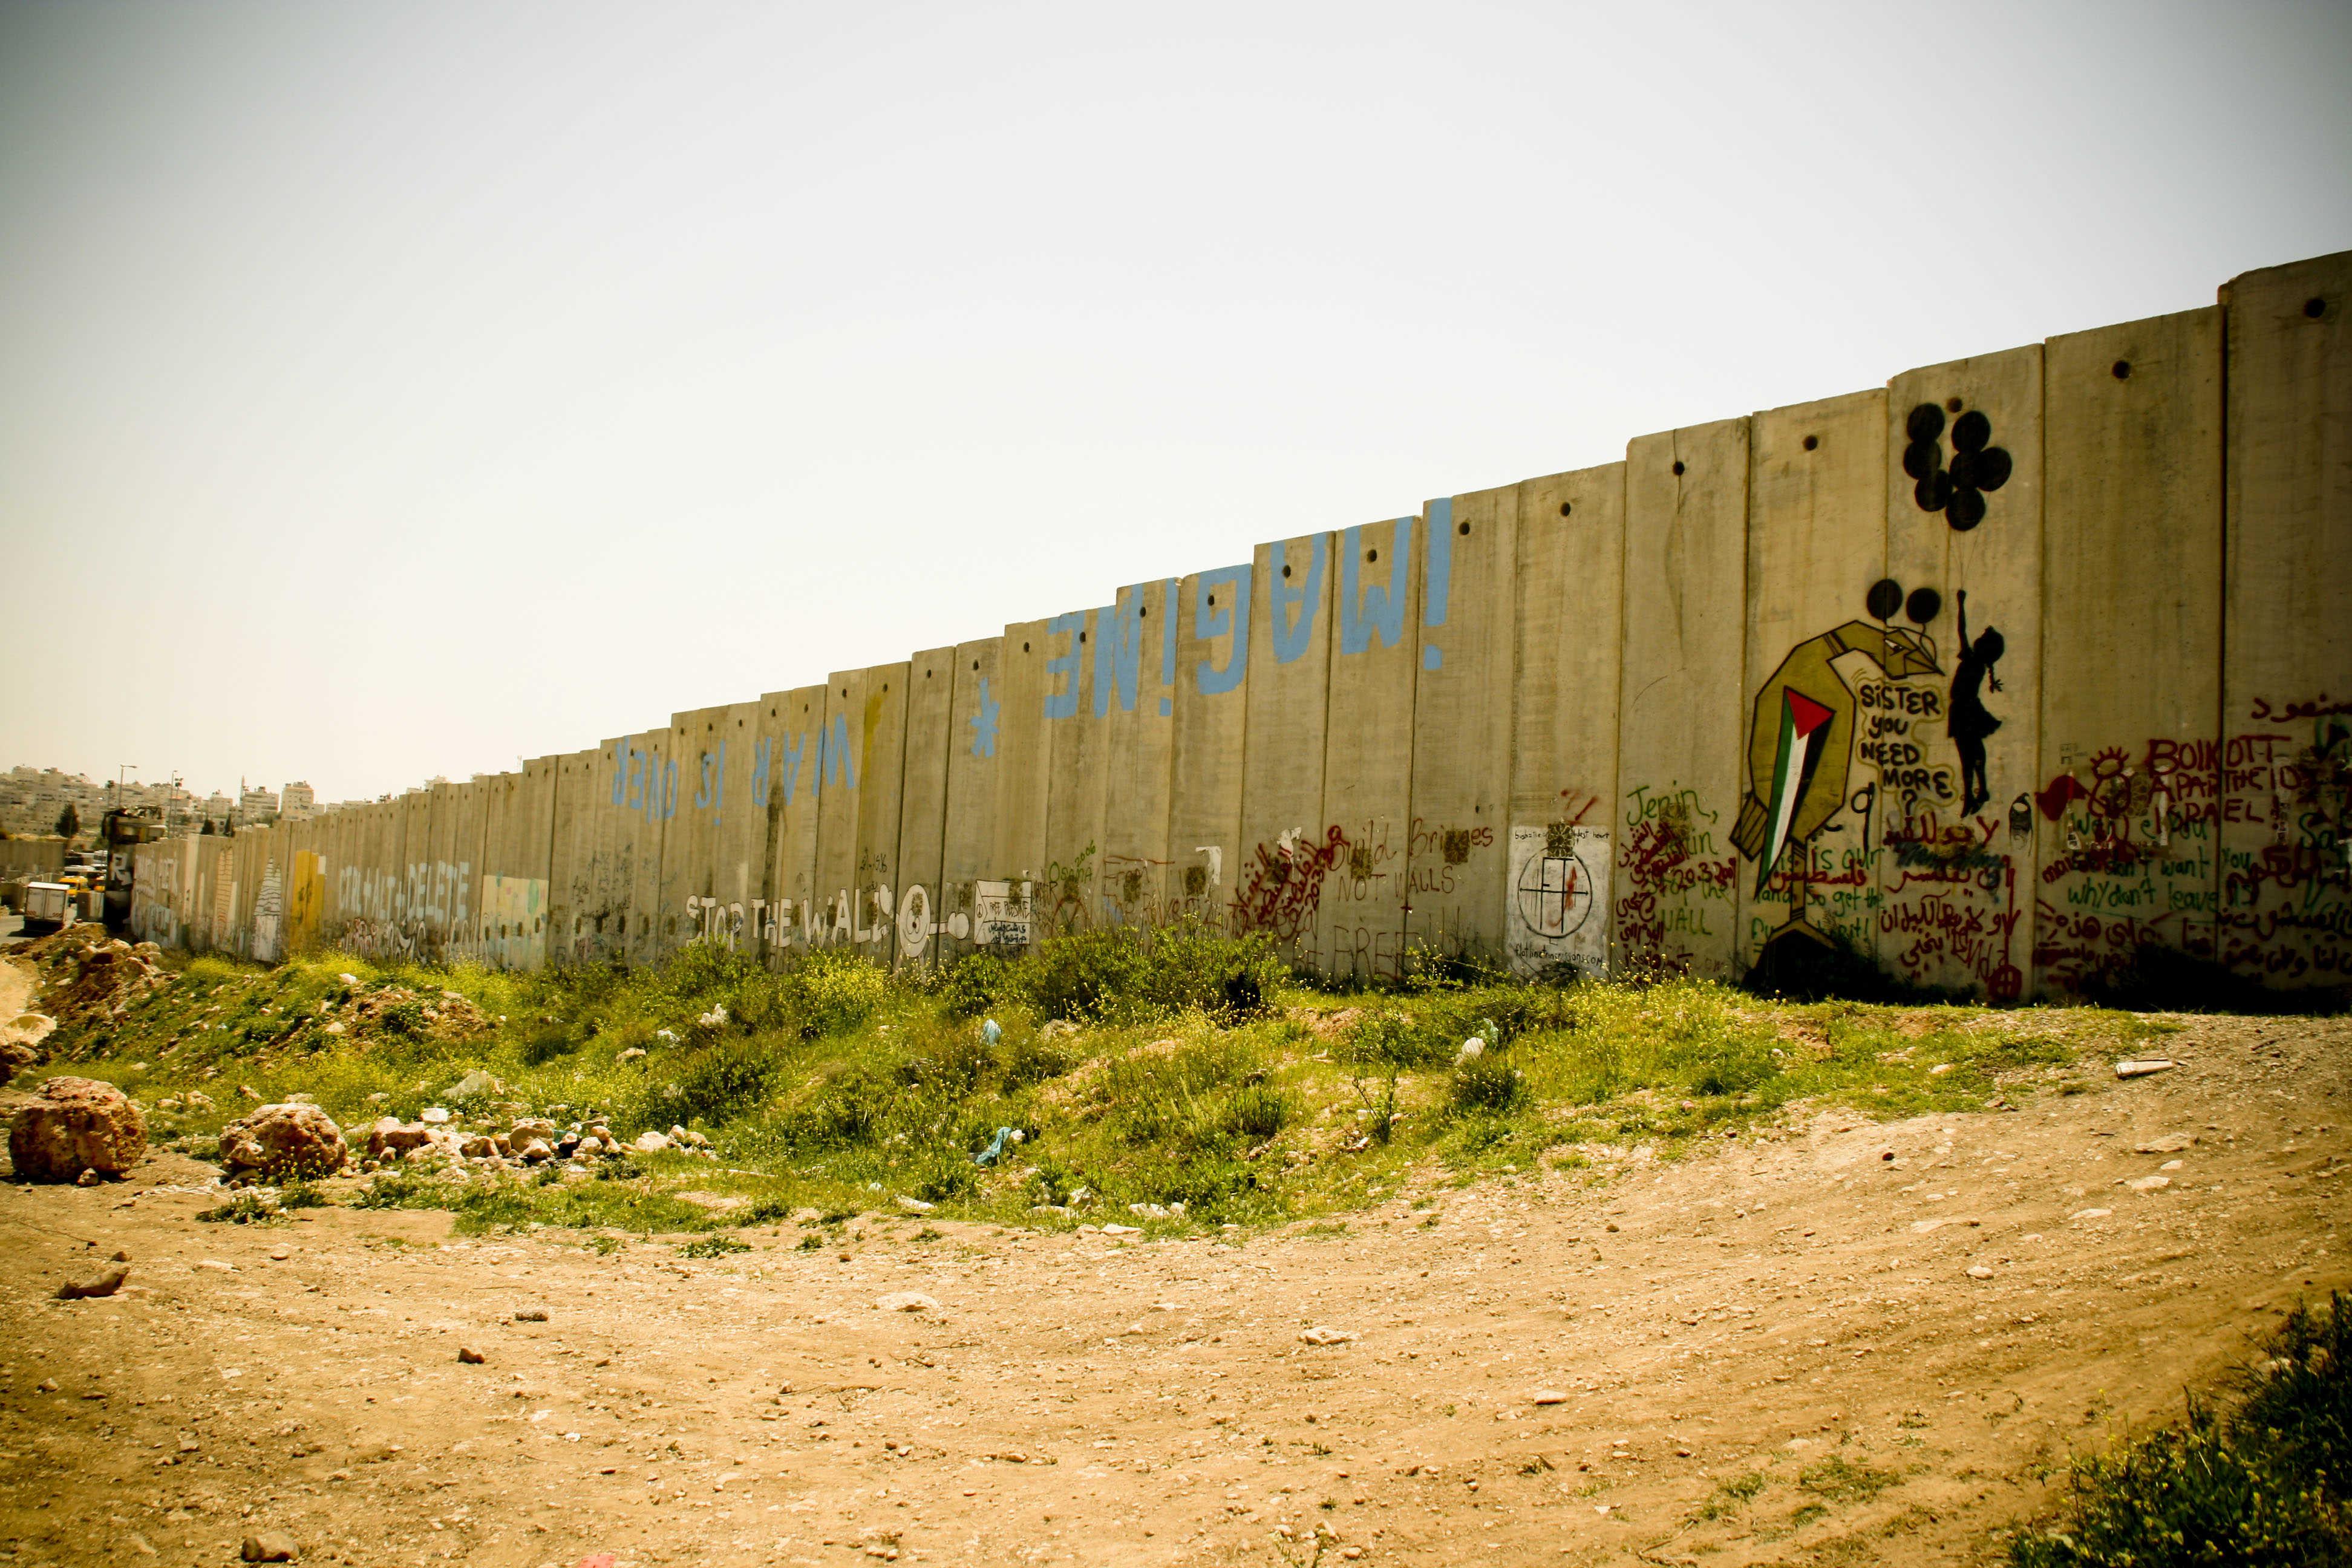 Palestine, graffiti as peaceful act of resistance - Khatt Foundation